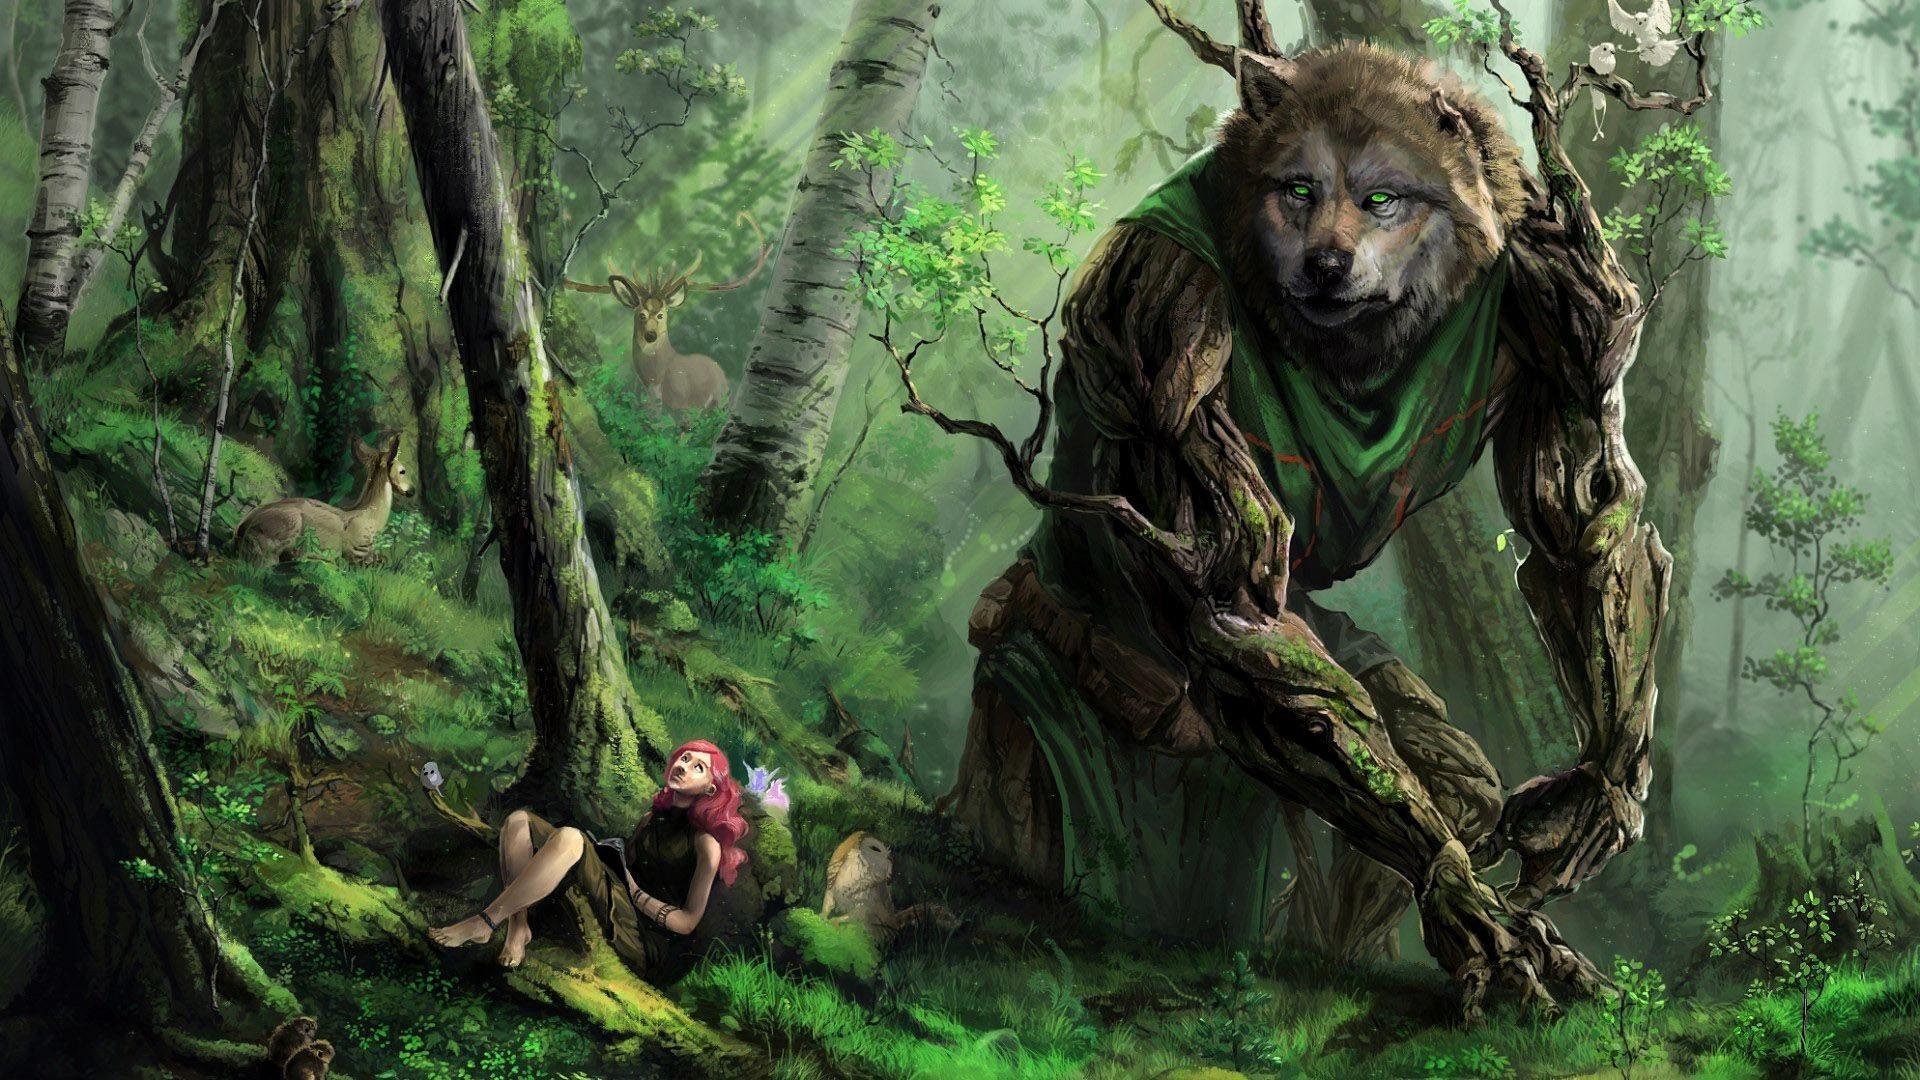 Fall Woodland Creatures Wallpaper Big Bad Wolf Art Id 108070 Art Abyss